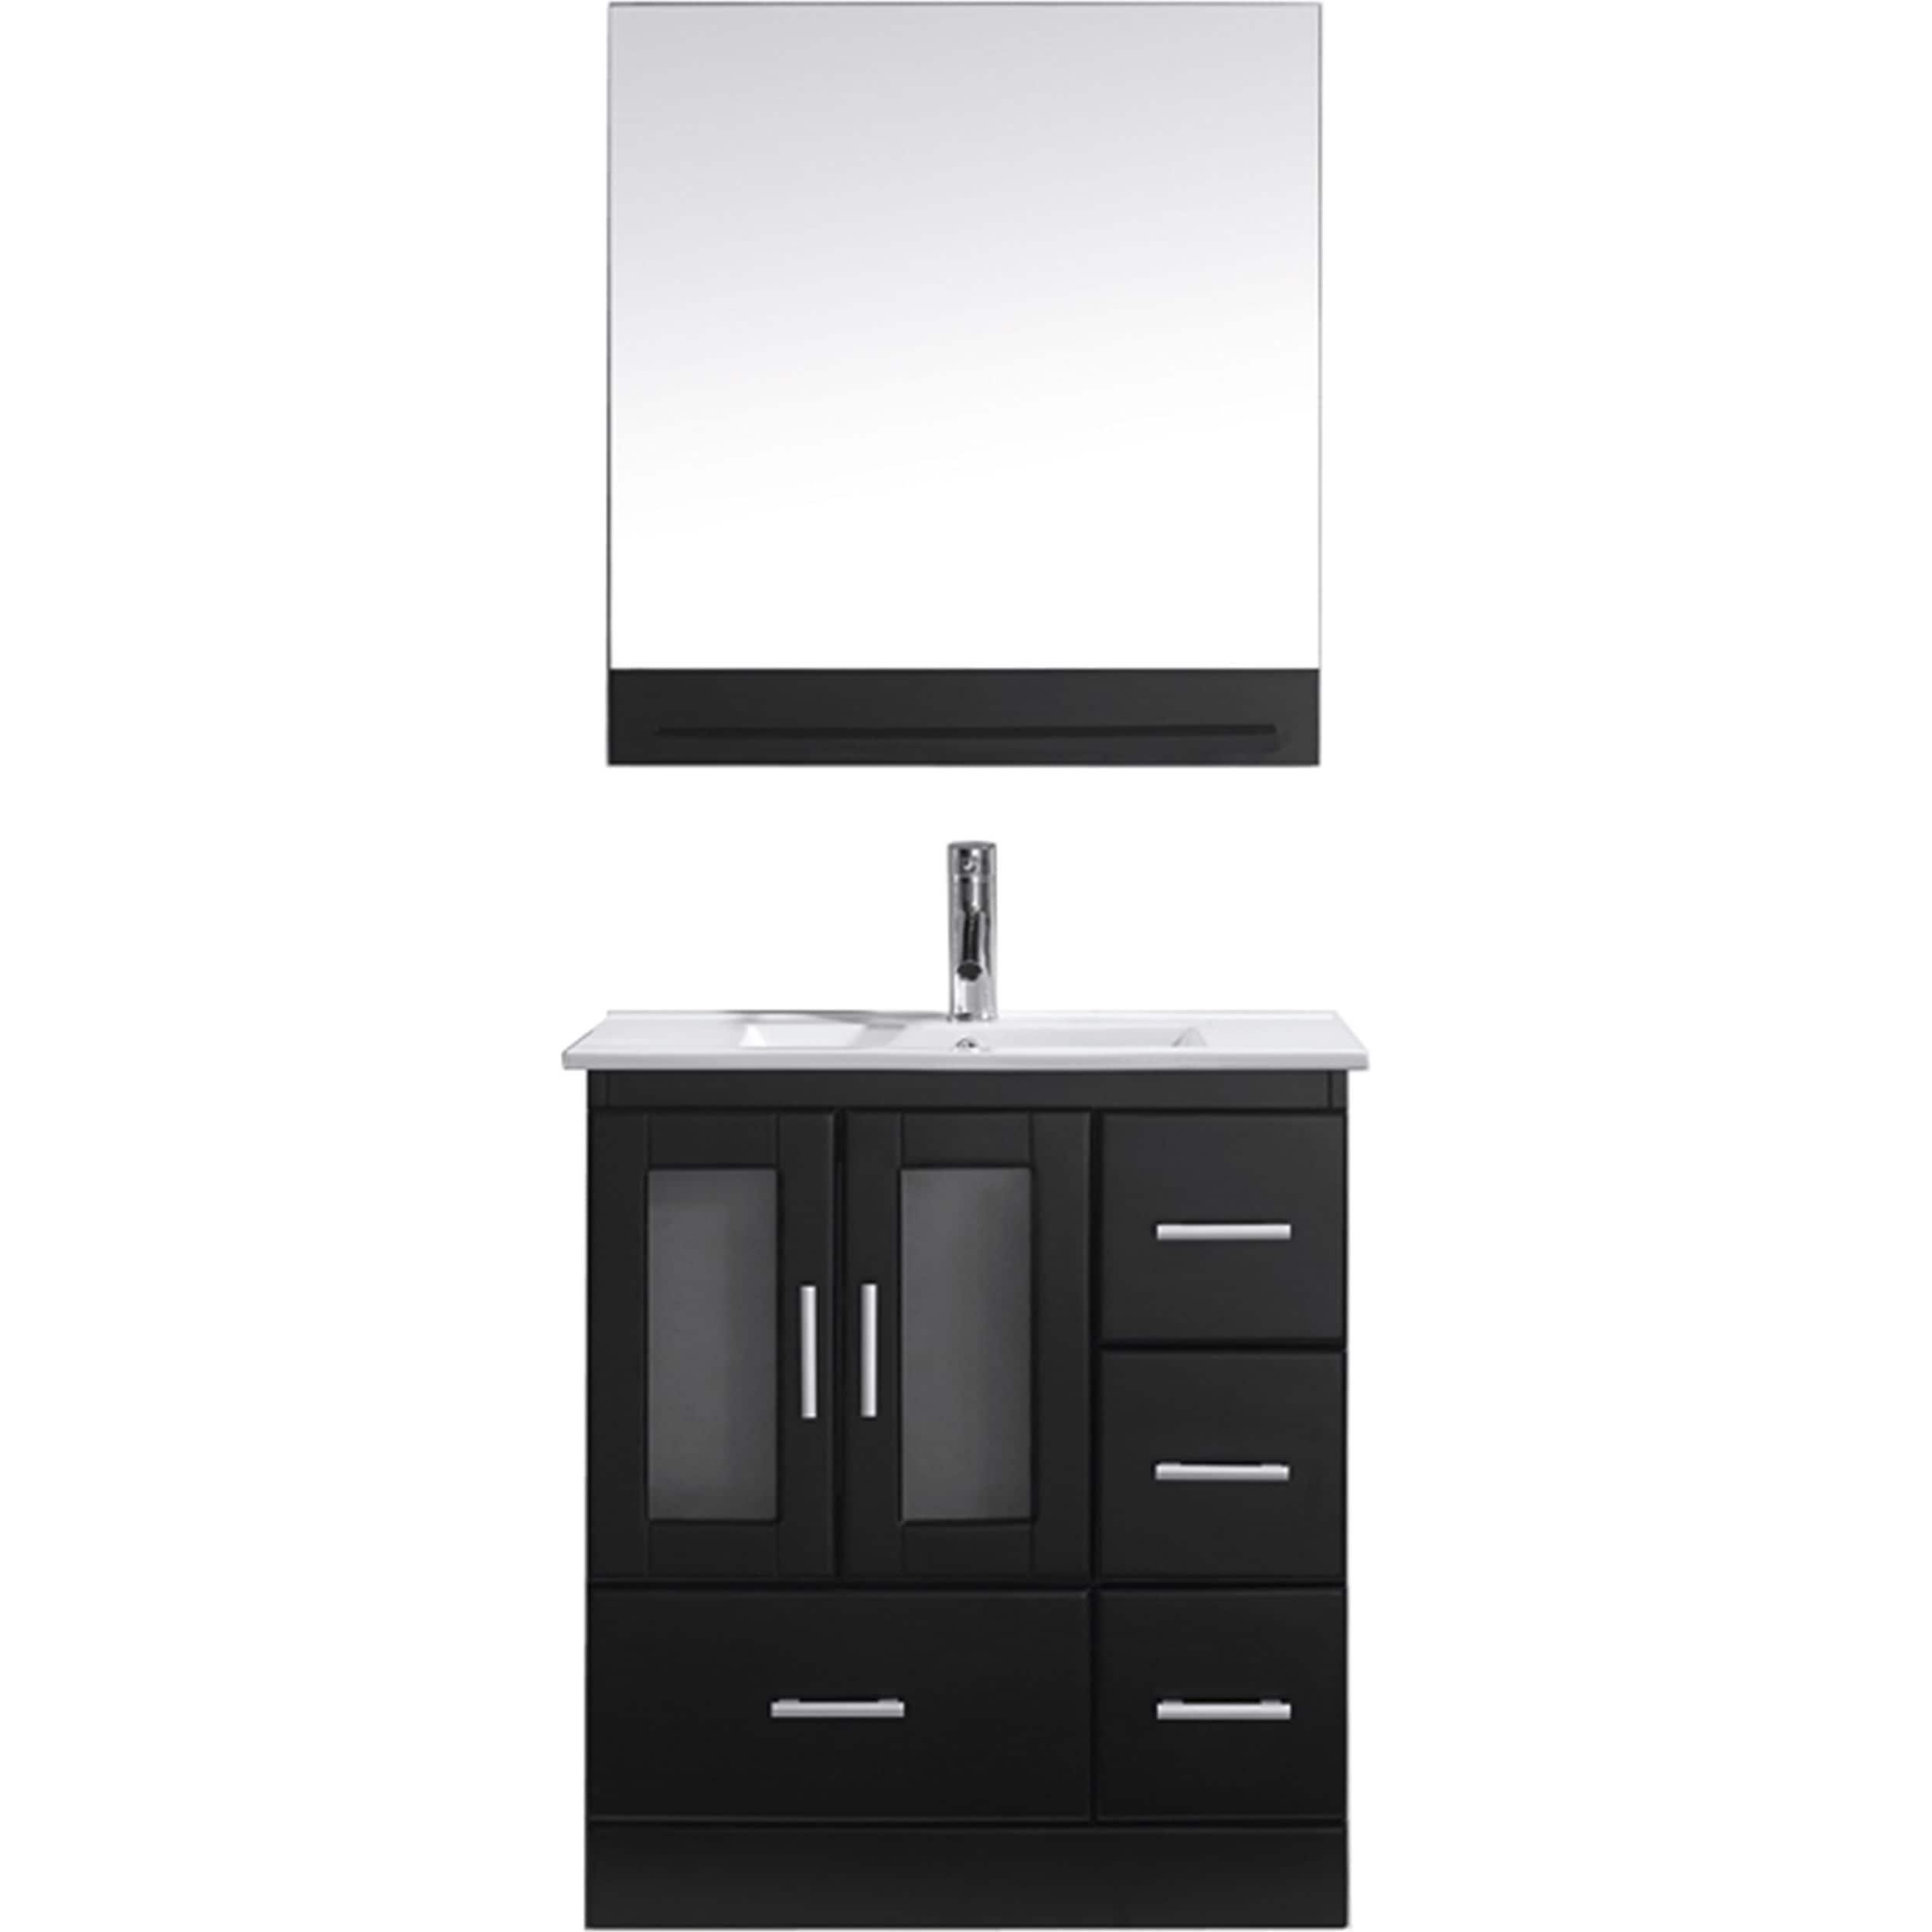 Shop Virtu USA Zola 30-inch Single Bathroom Vanity Set with Faucet ...